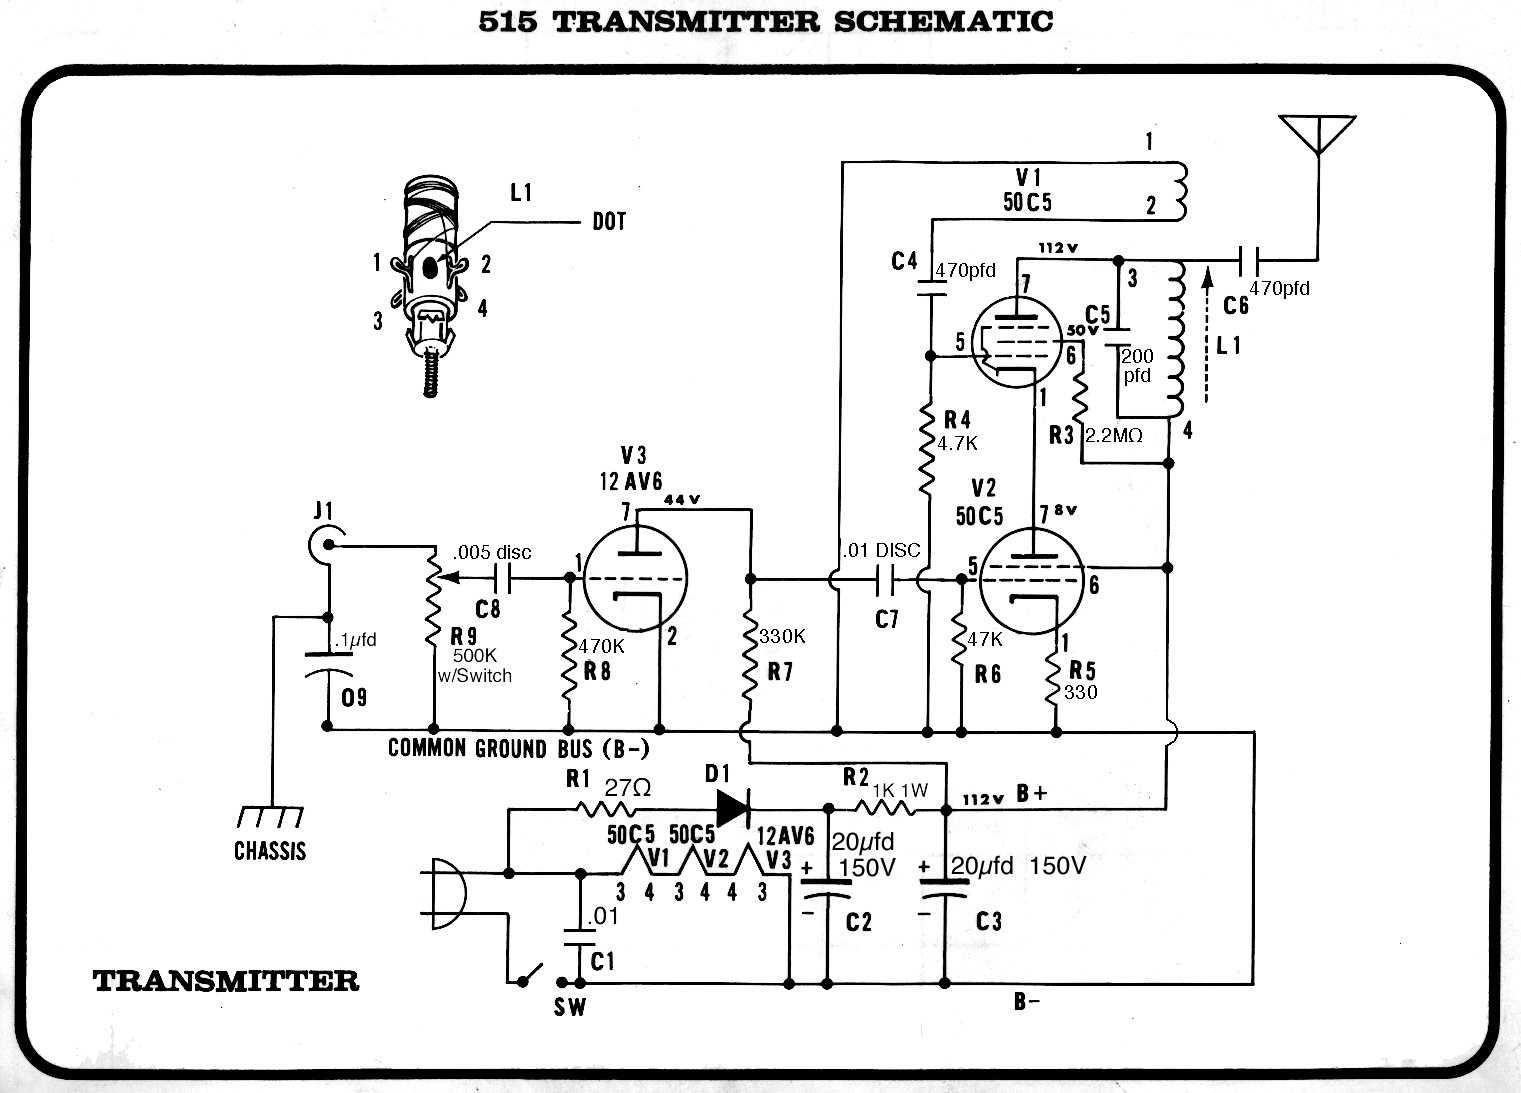 Graymark Transmiter